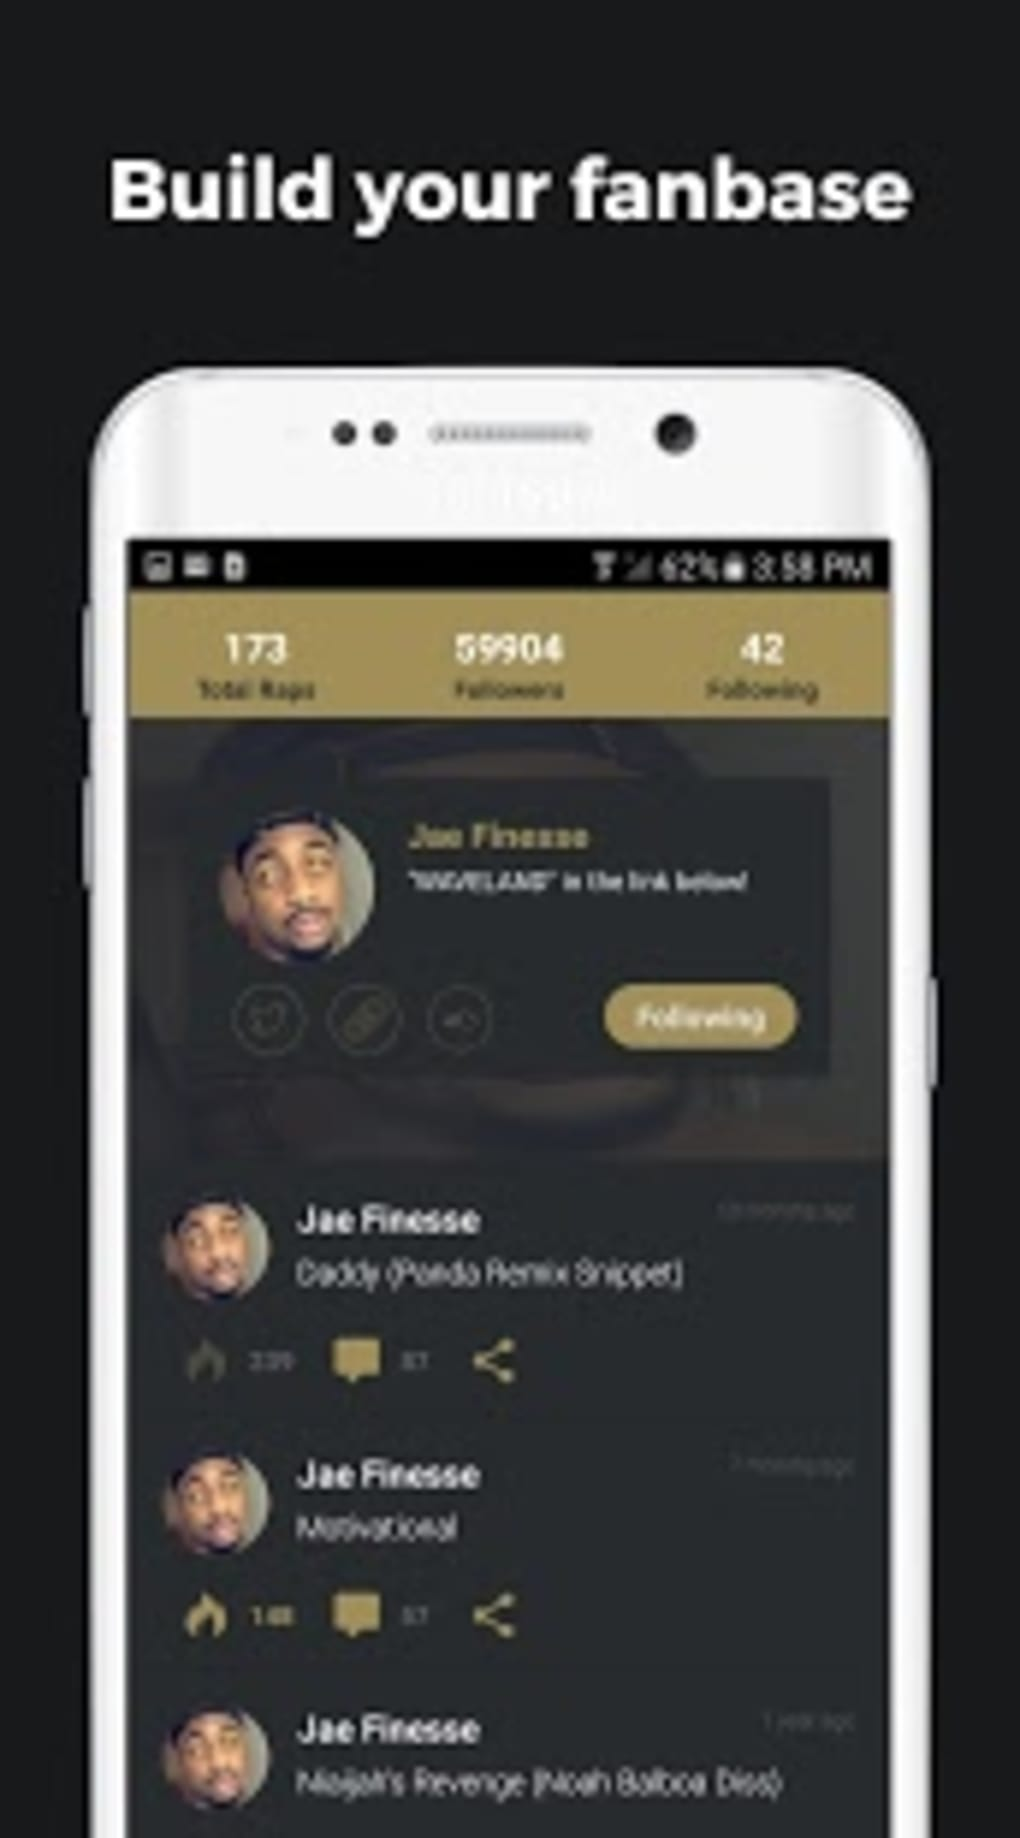 fl studio mobile 2.0.3 apk free